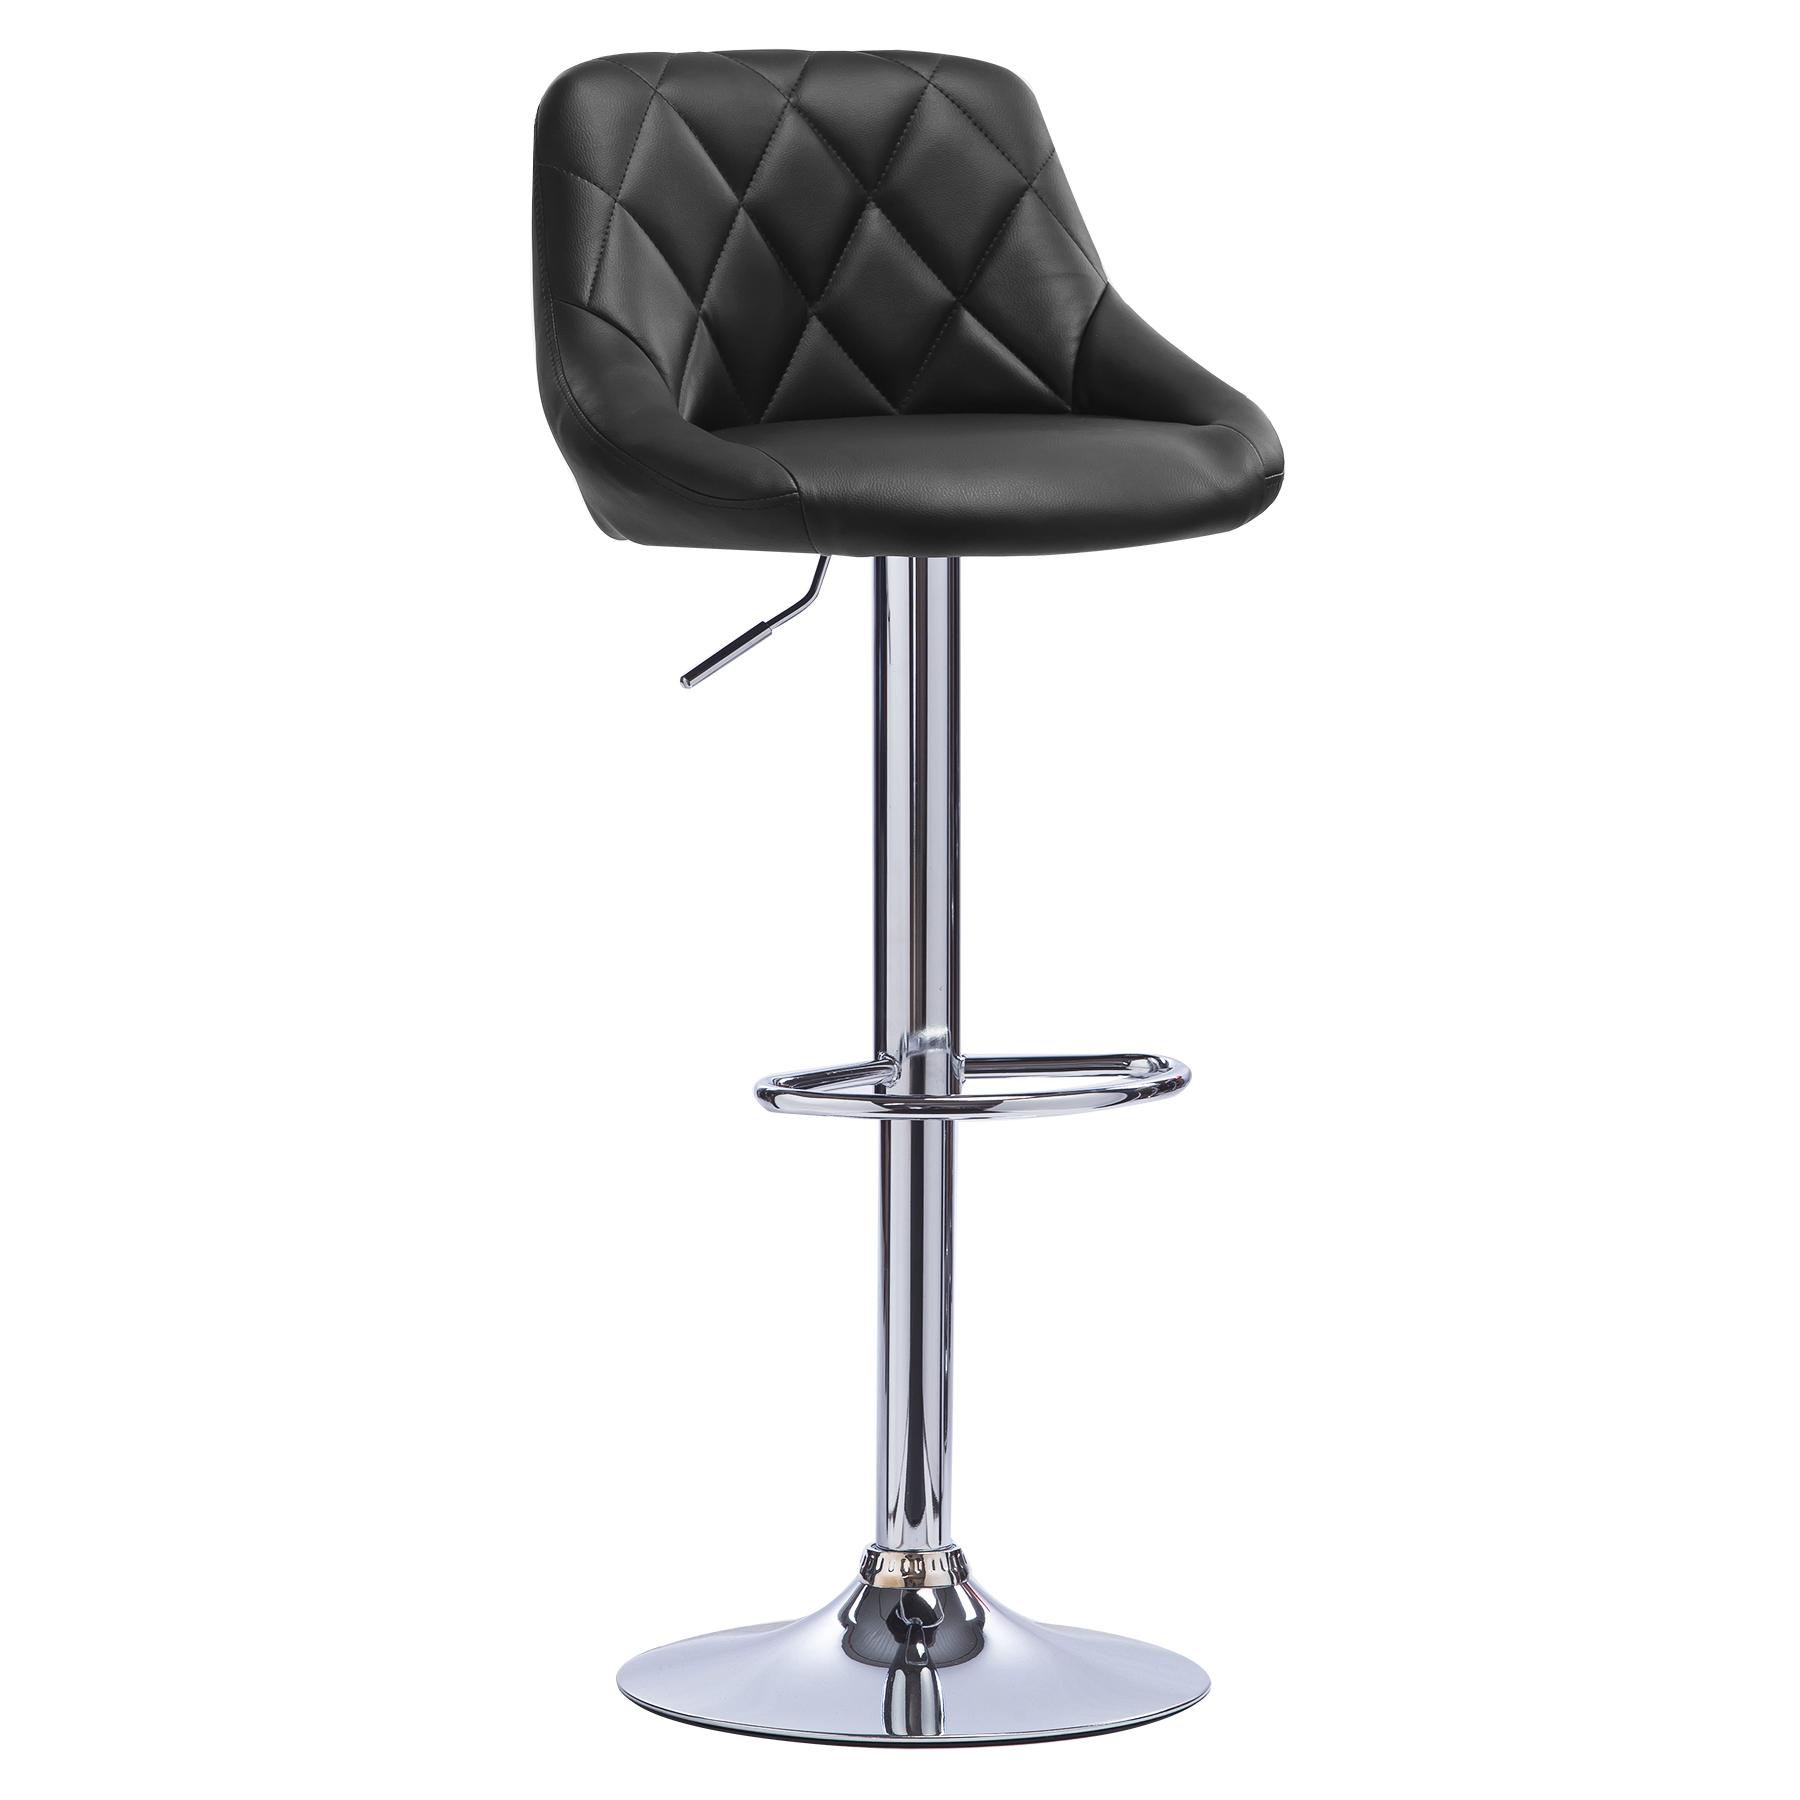 1 tabouret de bar pivotant en cuir synth tique chaise cuisine r glable f015 ebay. Black Bedroom Furniture Sets. Home Design Ideas